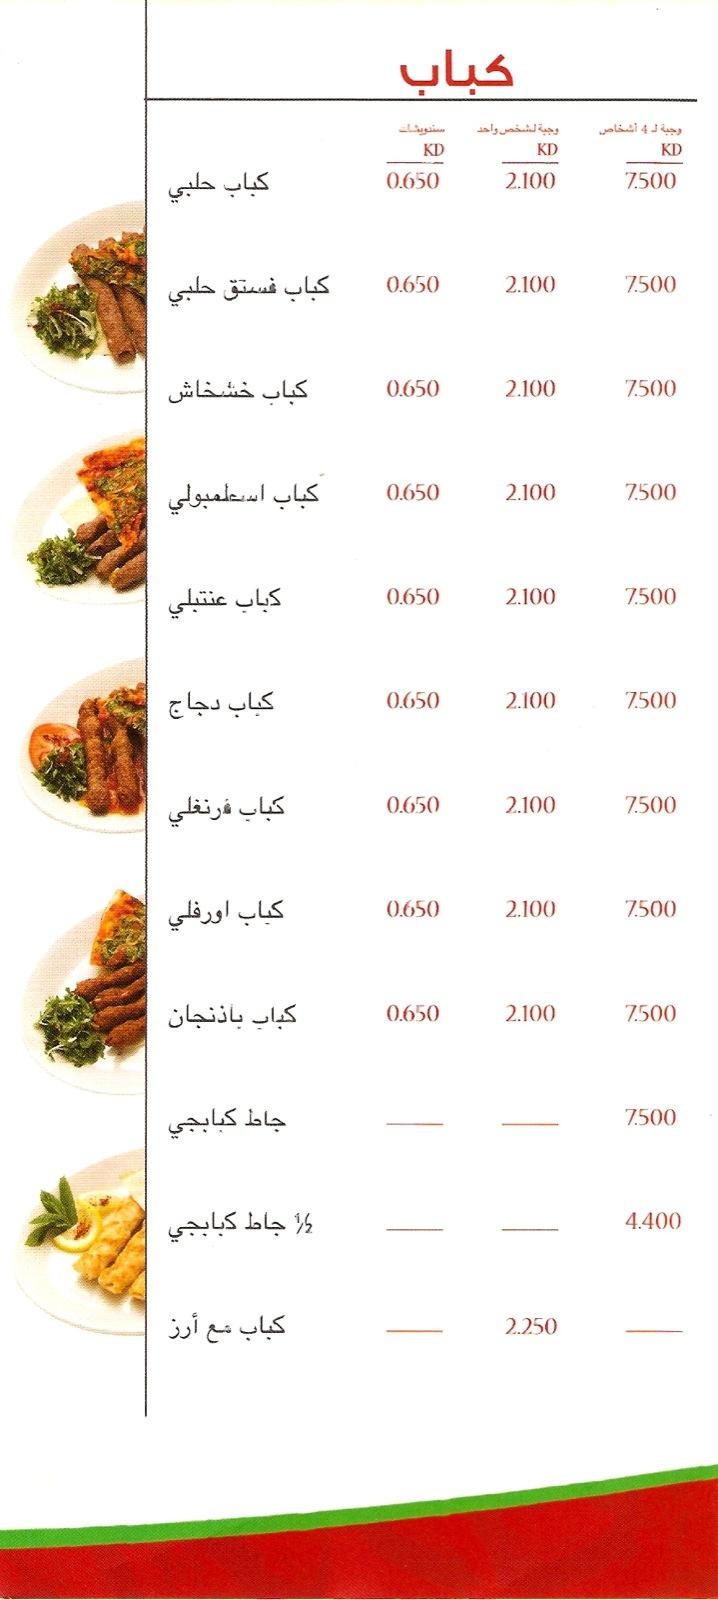 Kababji+kuwait+telephone